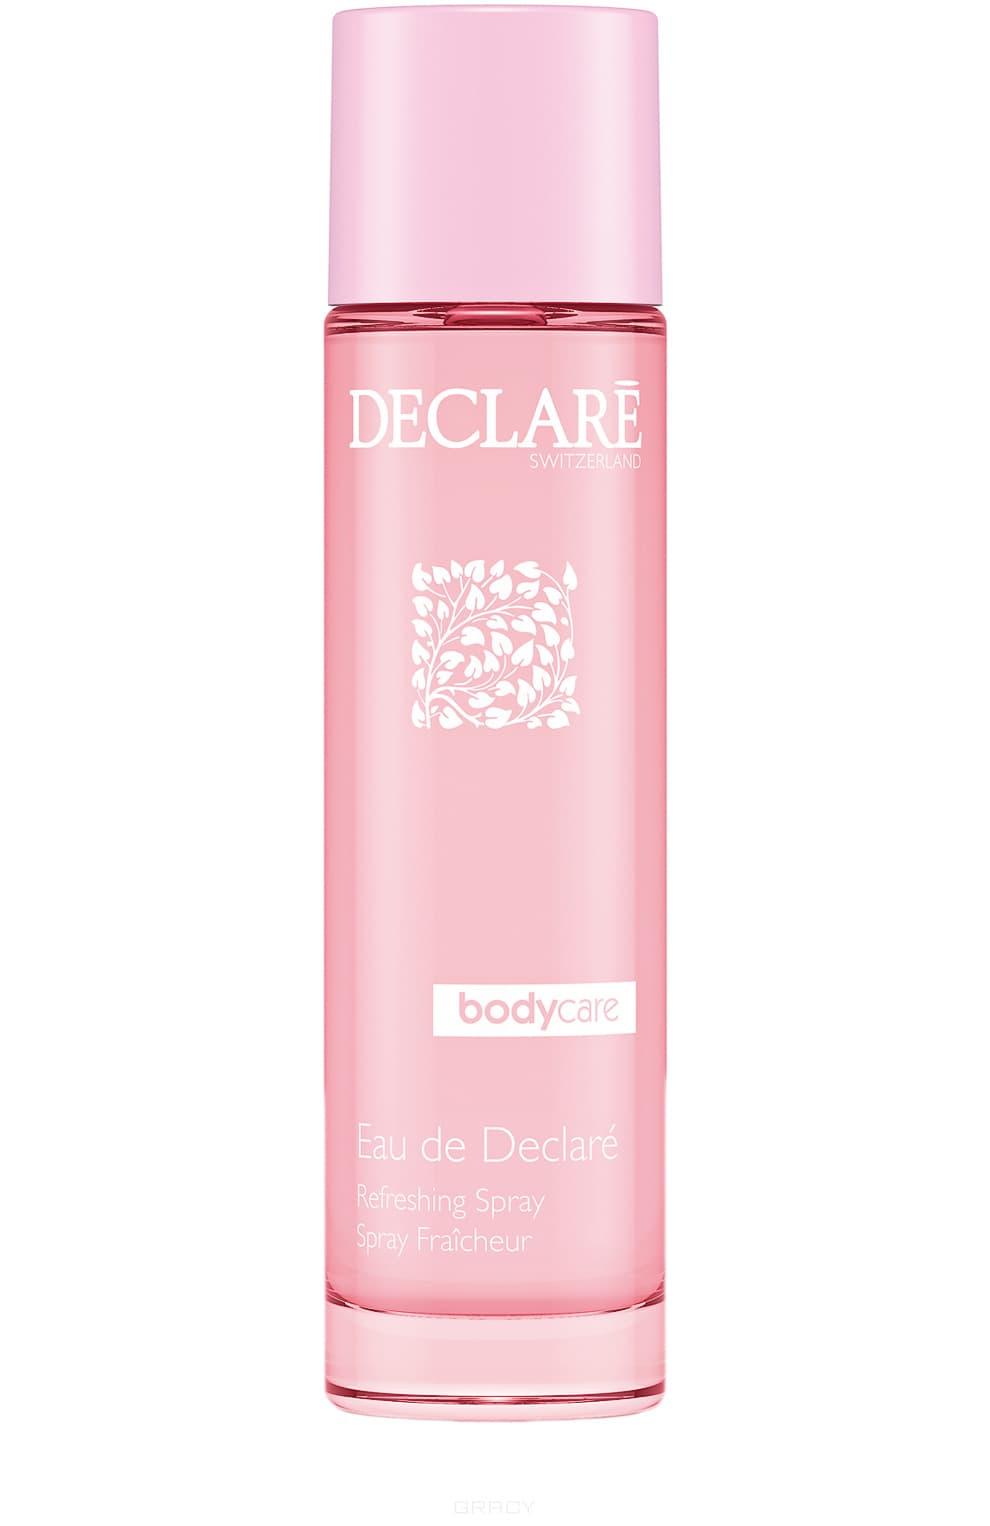 Declare, Освежающий спрей для тела Eau de Declar? Refreshing Spray, 100 млGreenism - эко-серия для ухода<br><br>